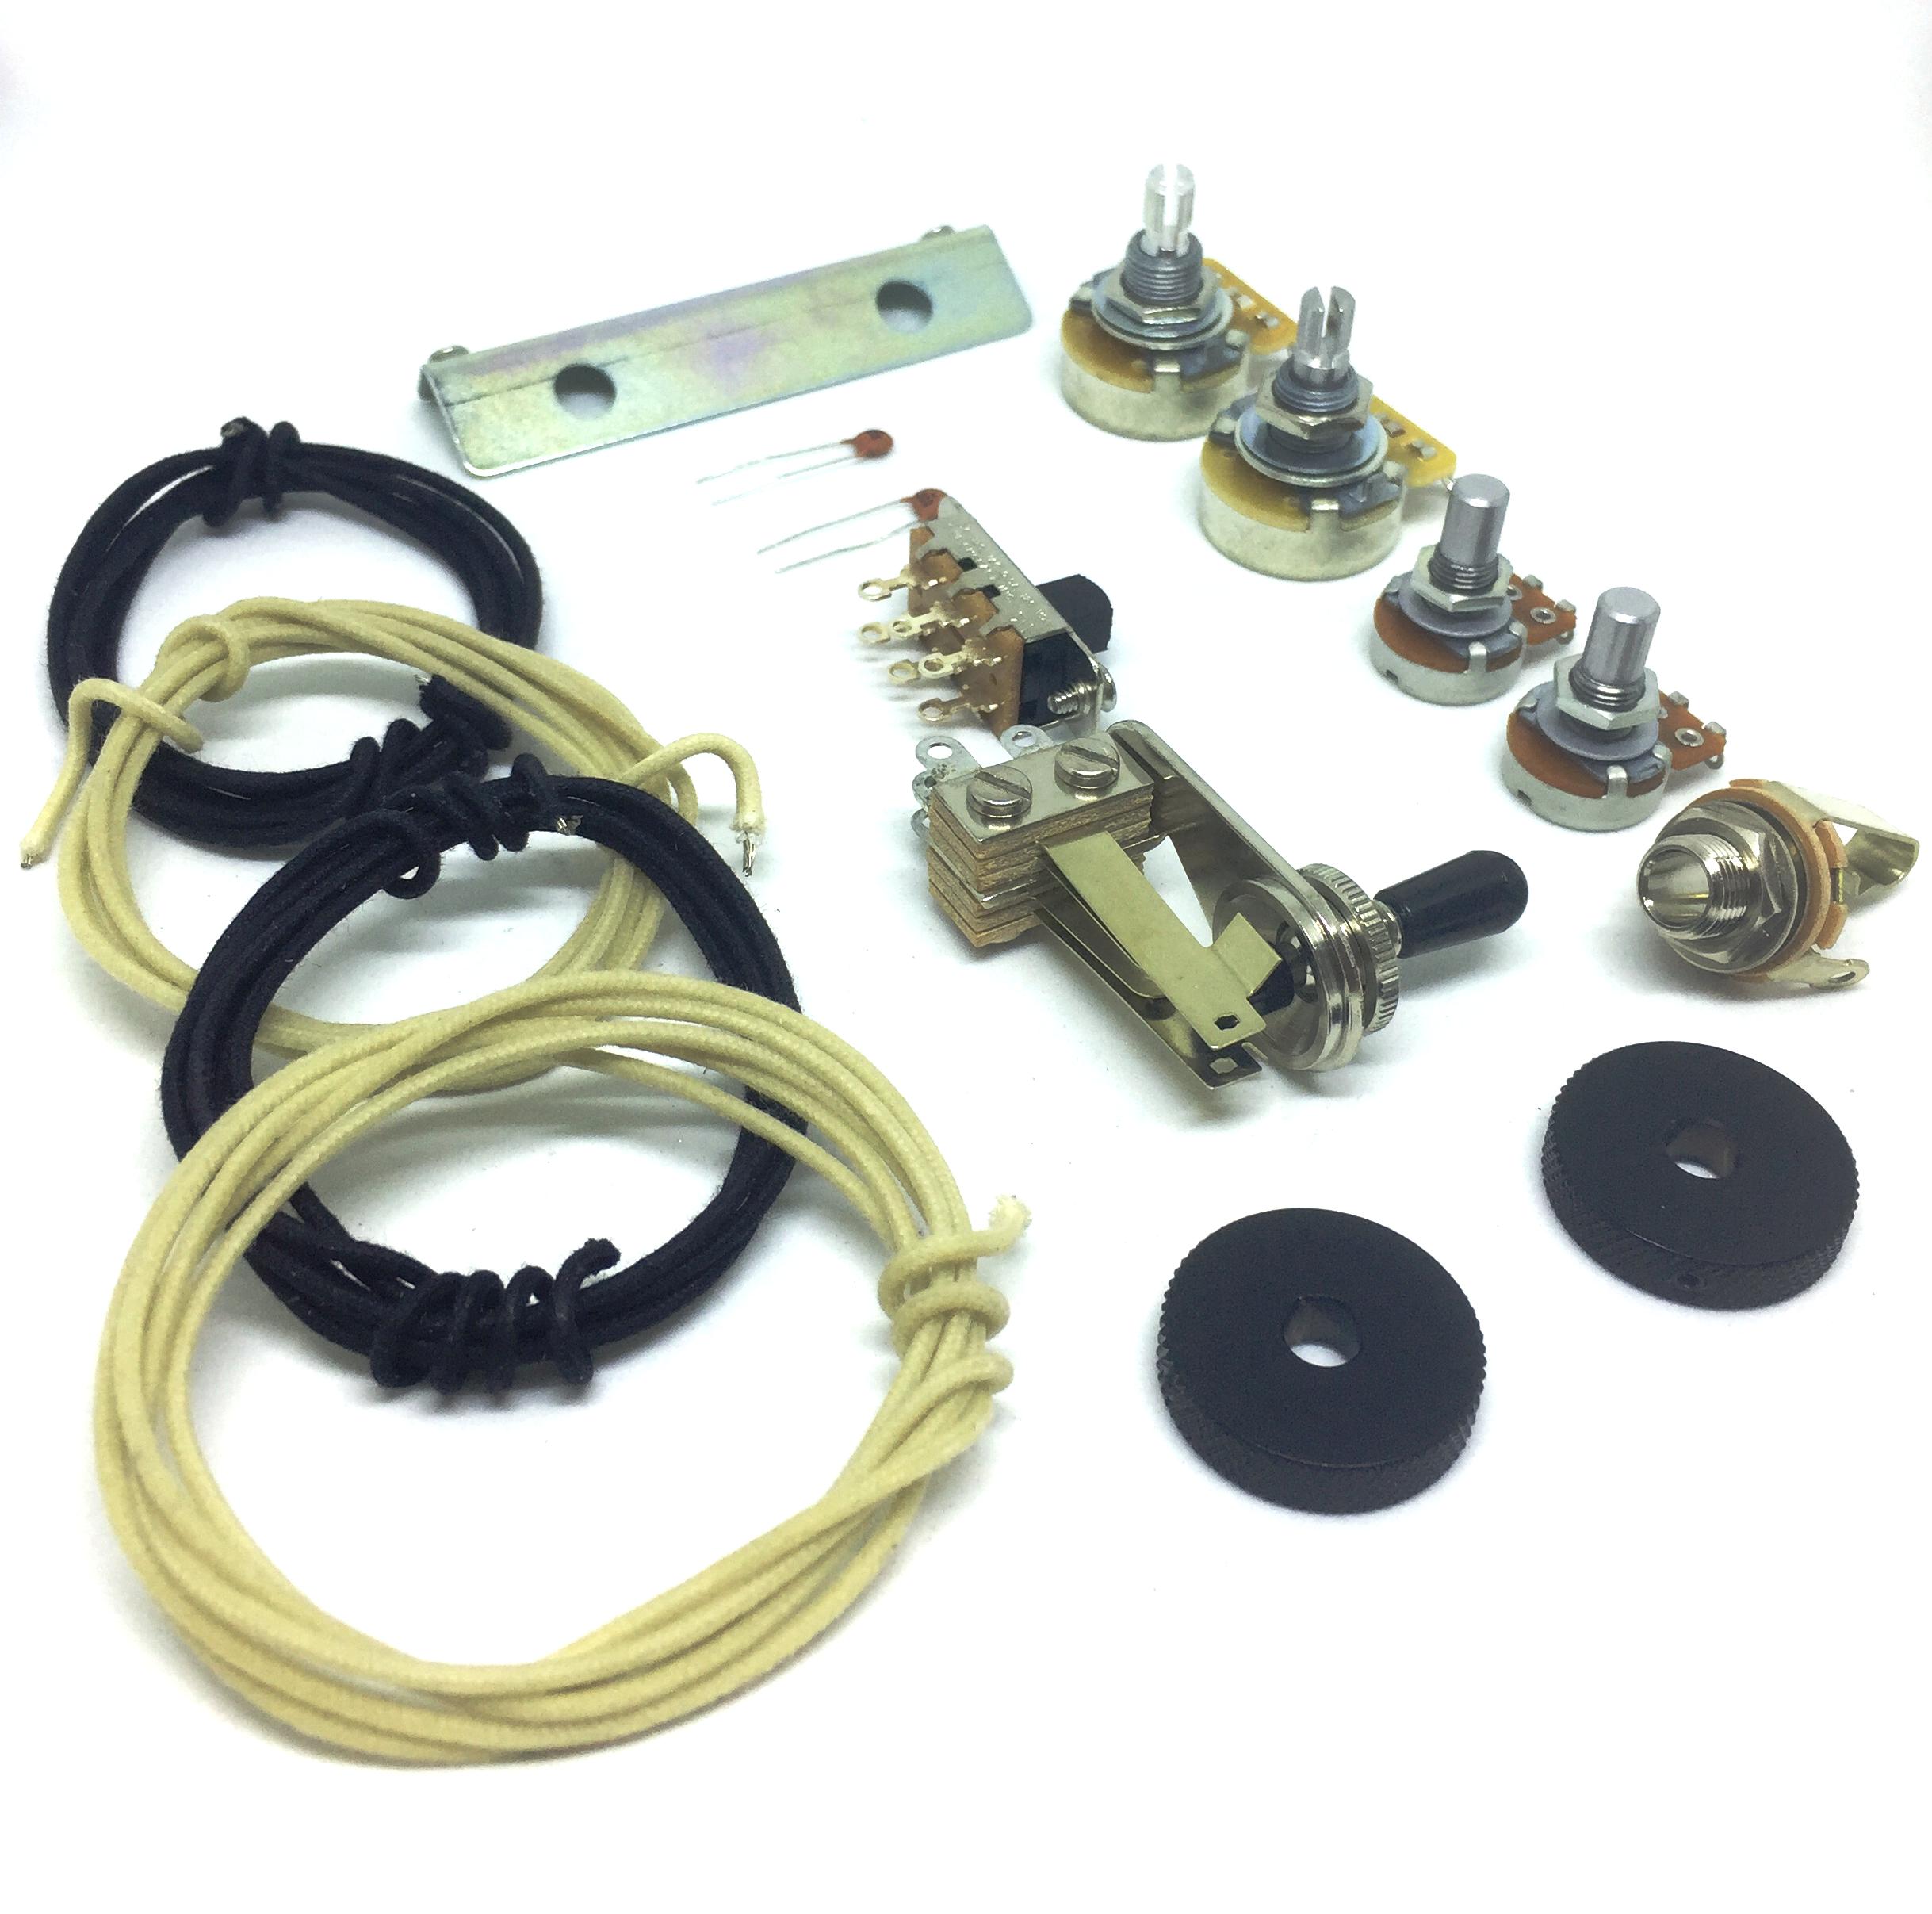 Swell Guitarslinger Products Jazzmaster Wiring Kit Upgrade Purchase Online Wiring Digital Resources Arguphilshebarightsorg